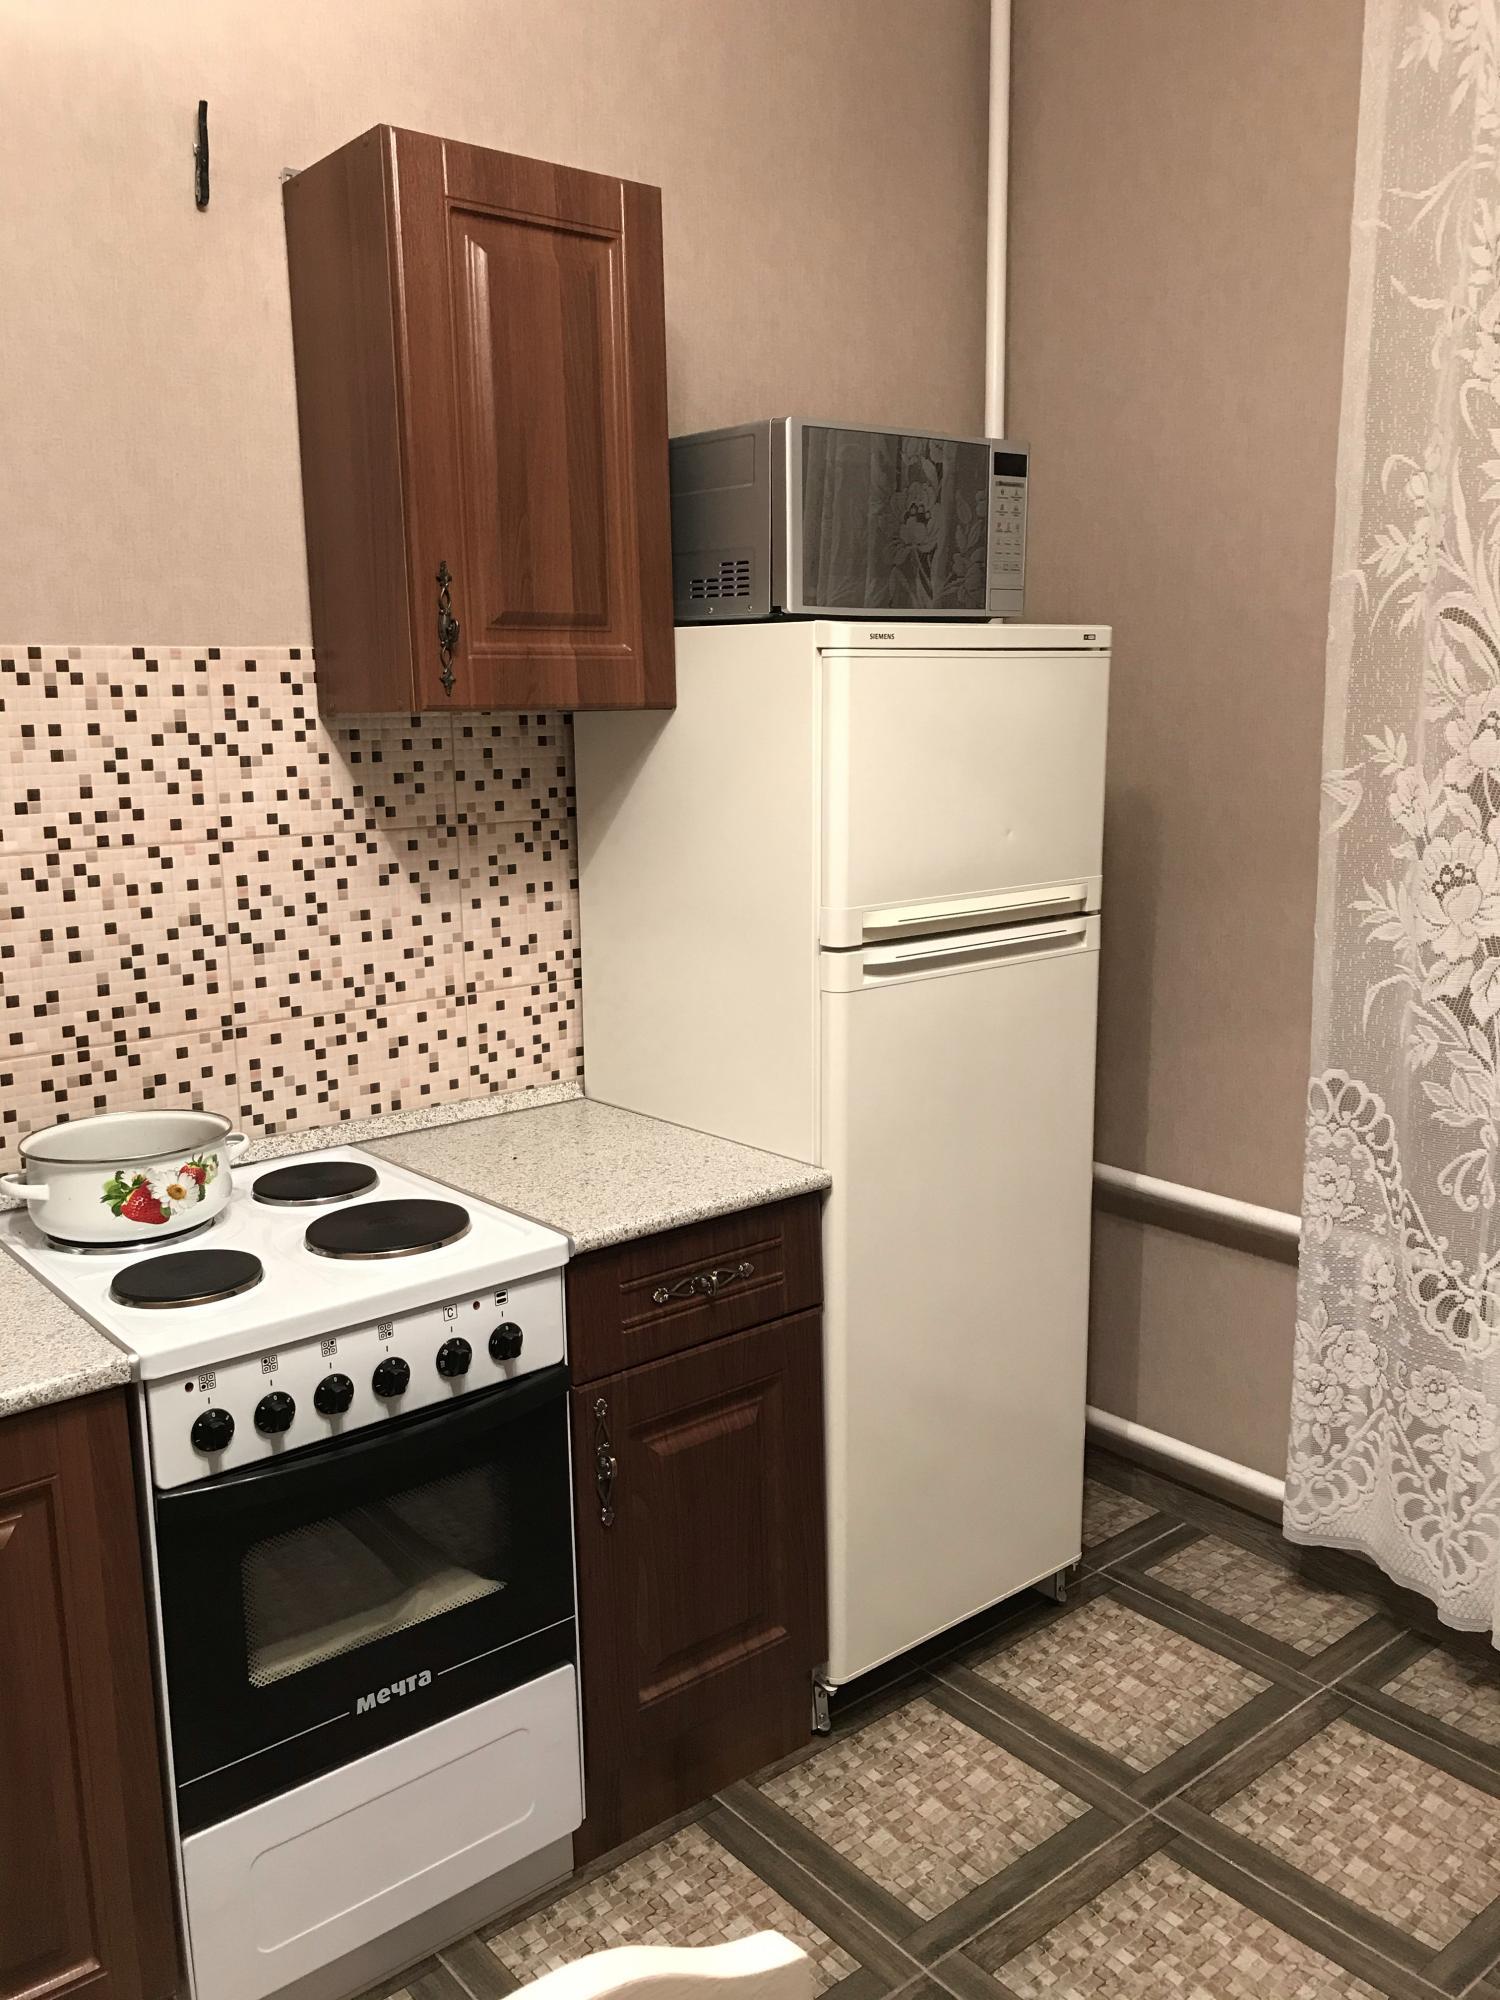 Квартира, 1 комната, 35 м² 89258601492 купить 2